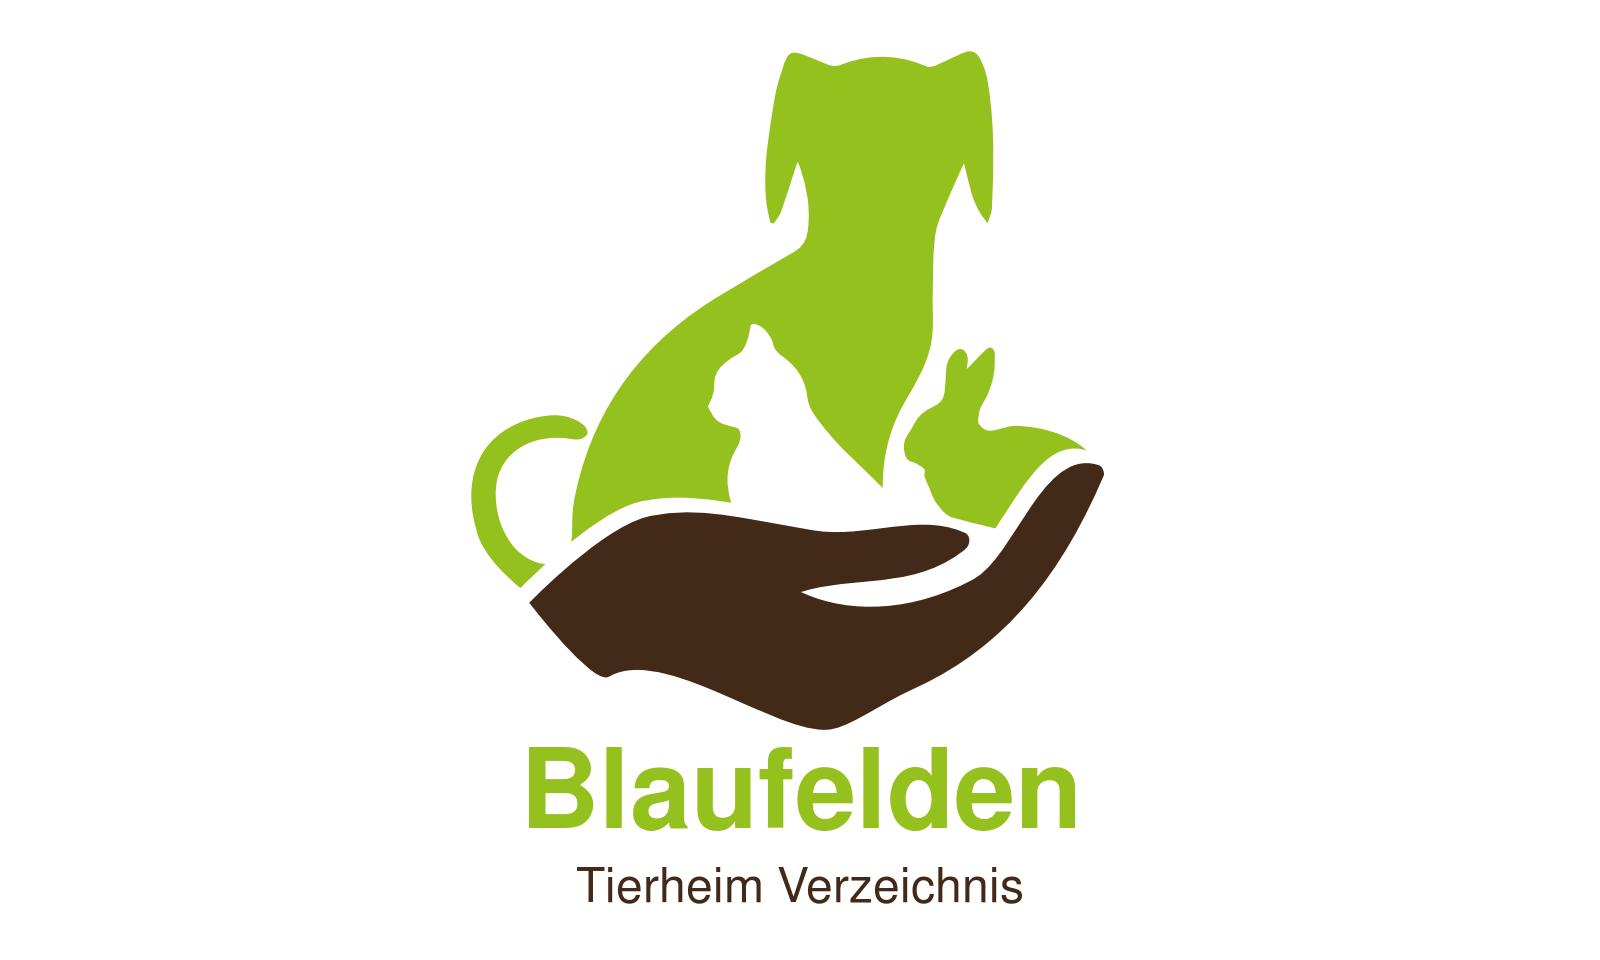 Tierheim Blaufelden